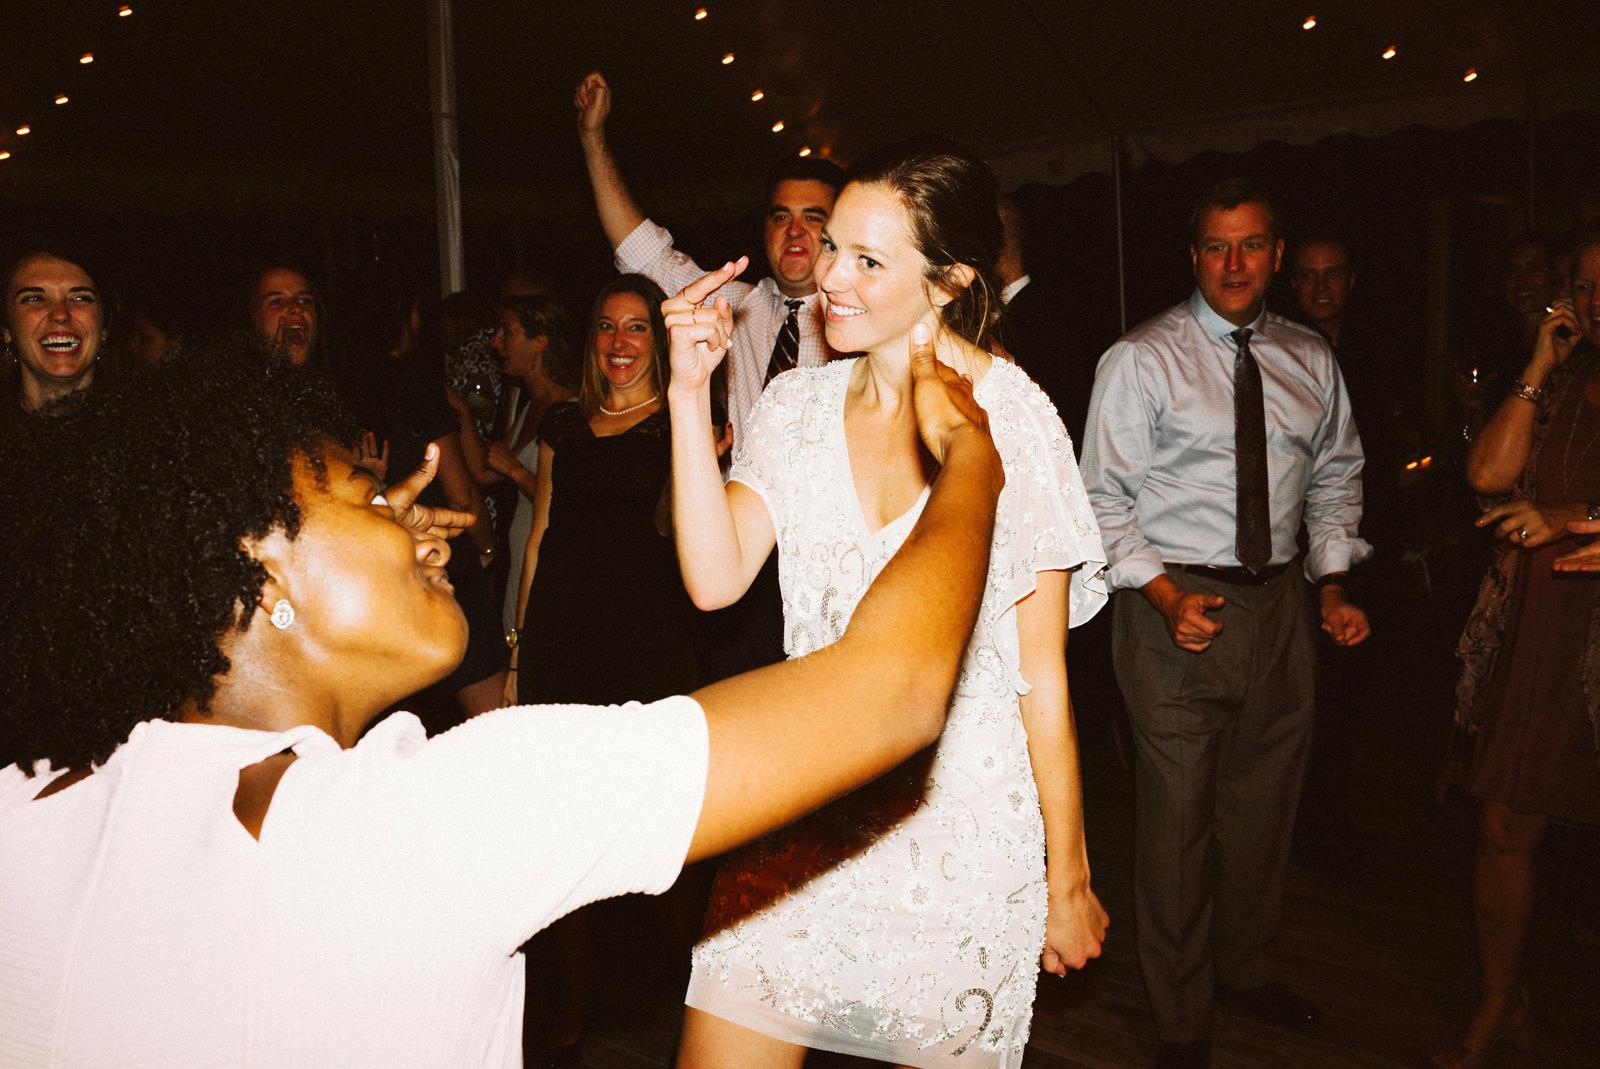 bridgeport-wedding-168 BRIDGEPORT, CONNECTICUT BACKYARD WEDDING